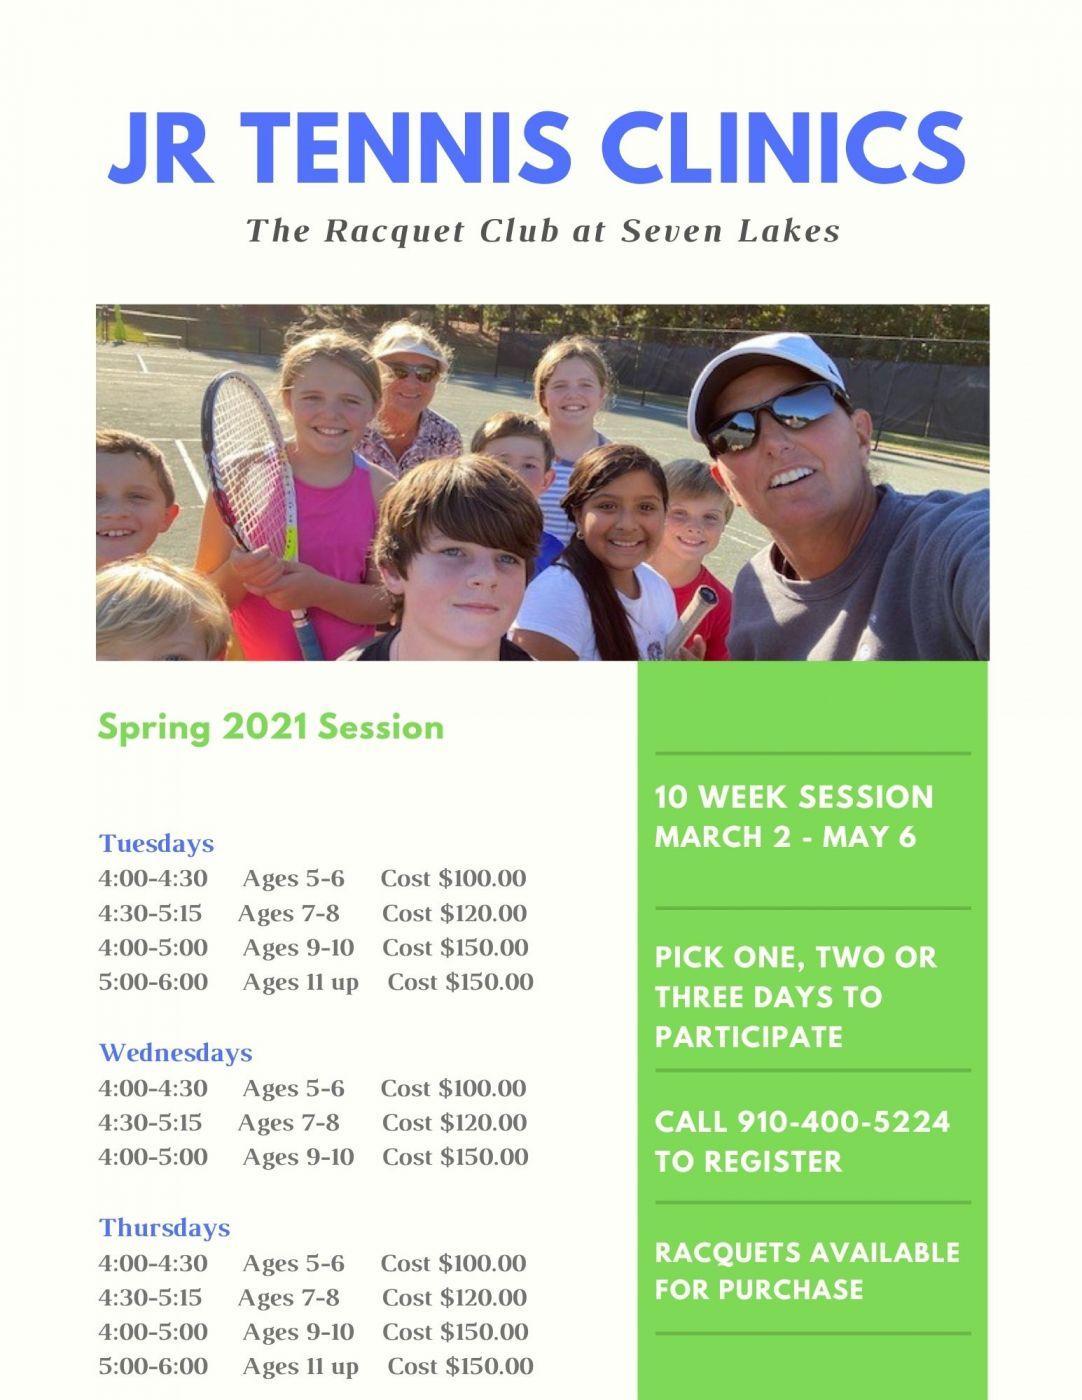 Jr Tennis Clinics